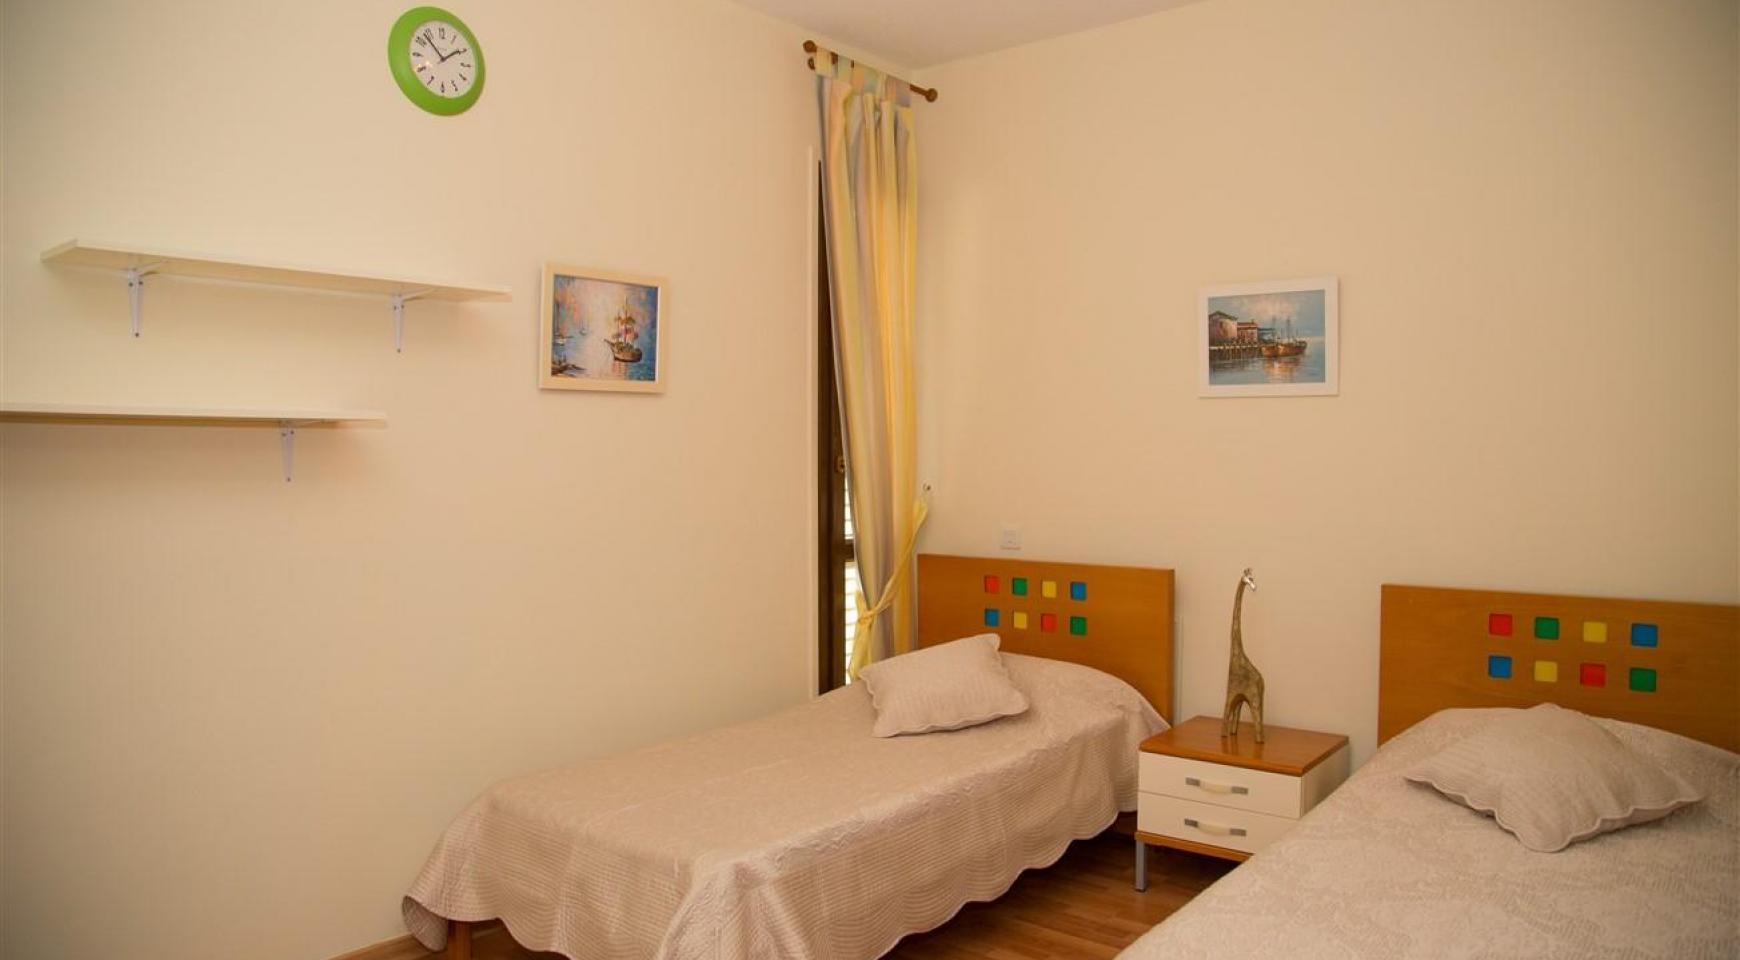 3-Спальная Квартира на Берегу Моря в Комплексе Thera   - 31